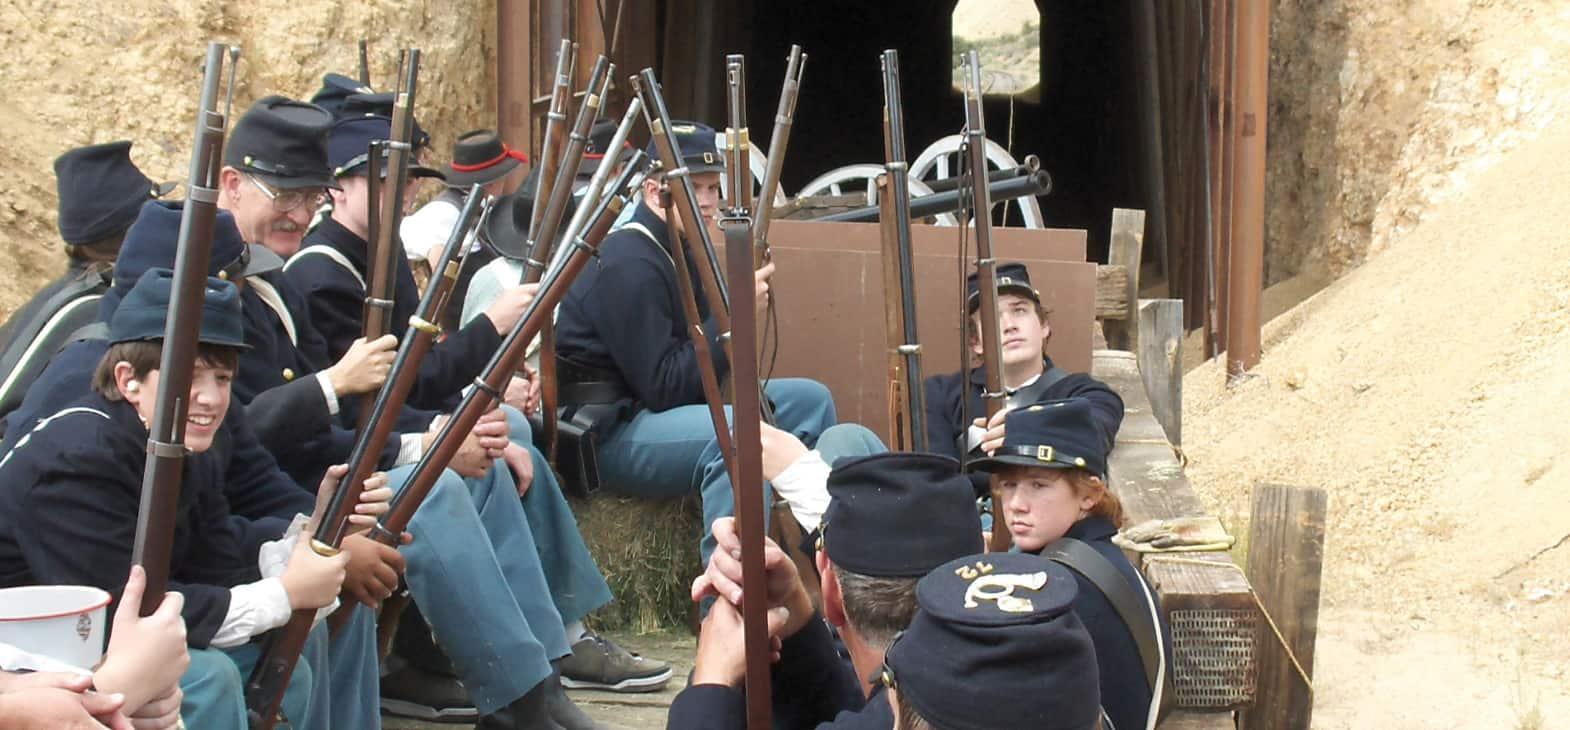 V&T Railway Virginia city to Gold hill Steam Engine reenactment